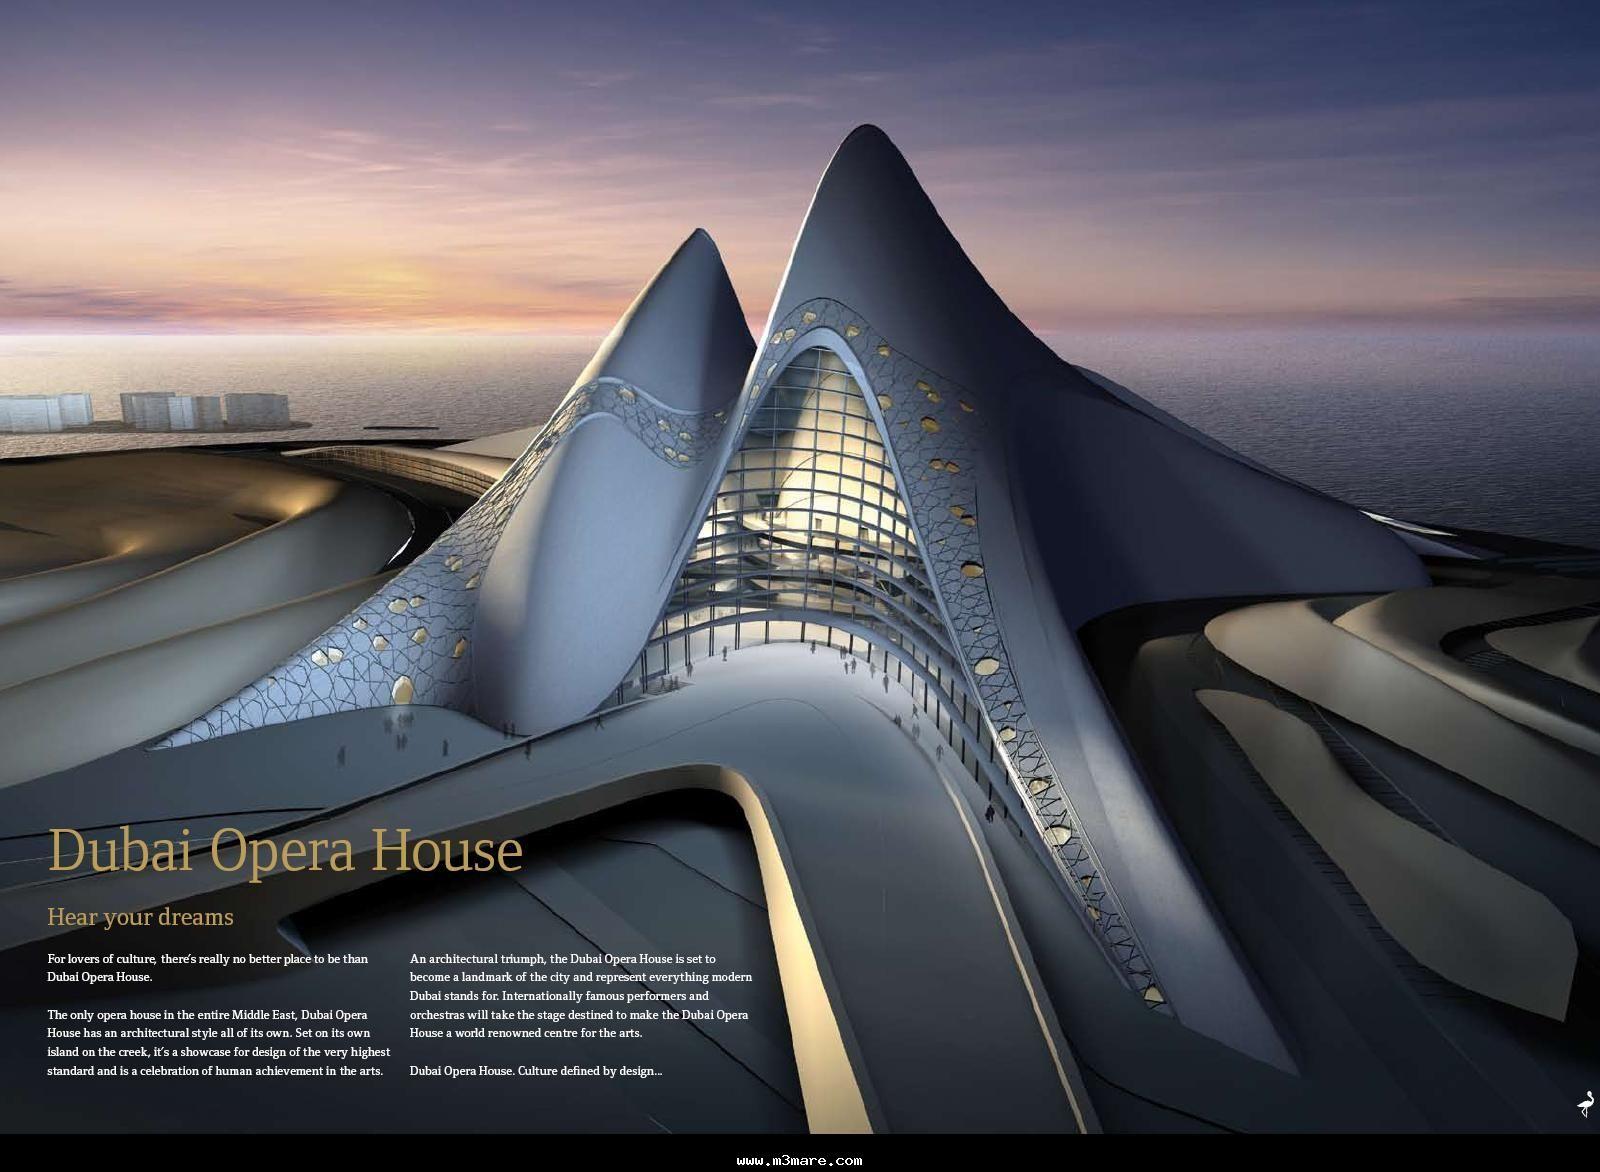 Modern Architecture Zaha Hadid dubai opera house - zaha hadid - #architecture - ☮k☮ - #modern